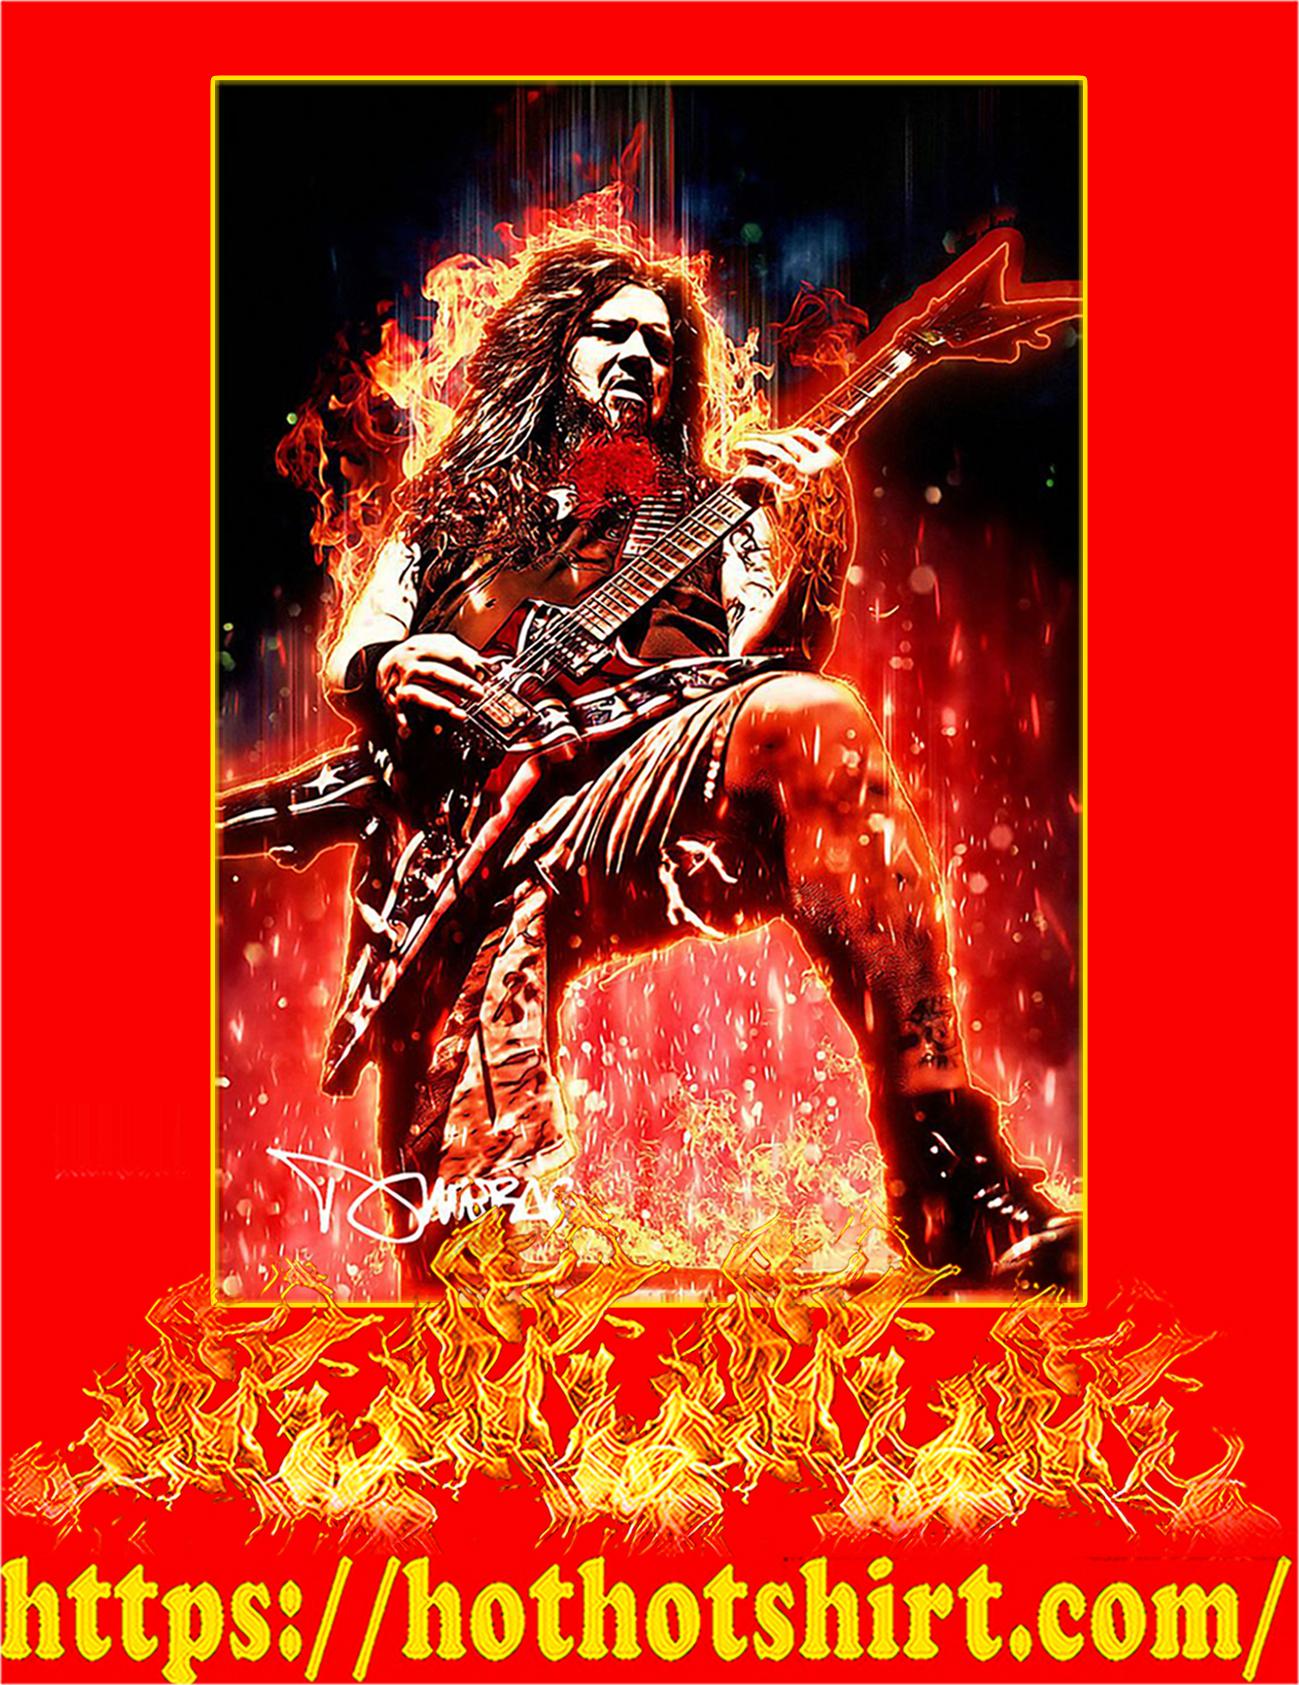 Legendary Dimebag Darrell Signature Poster - A4